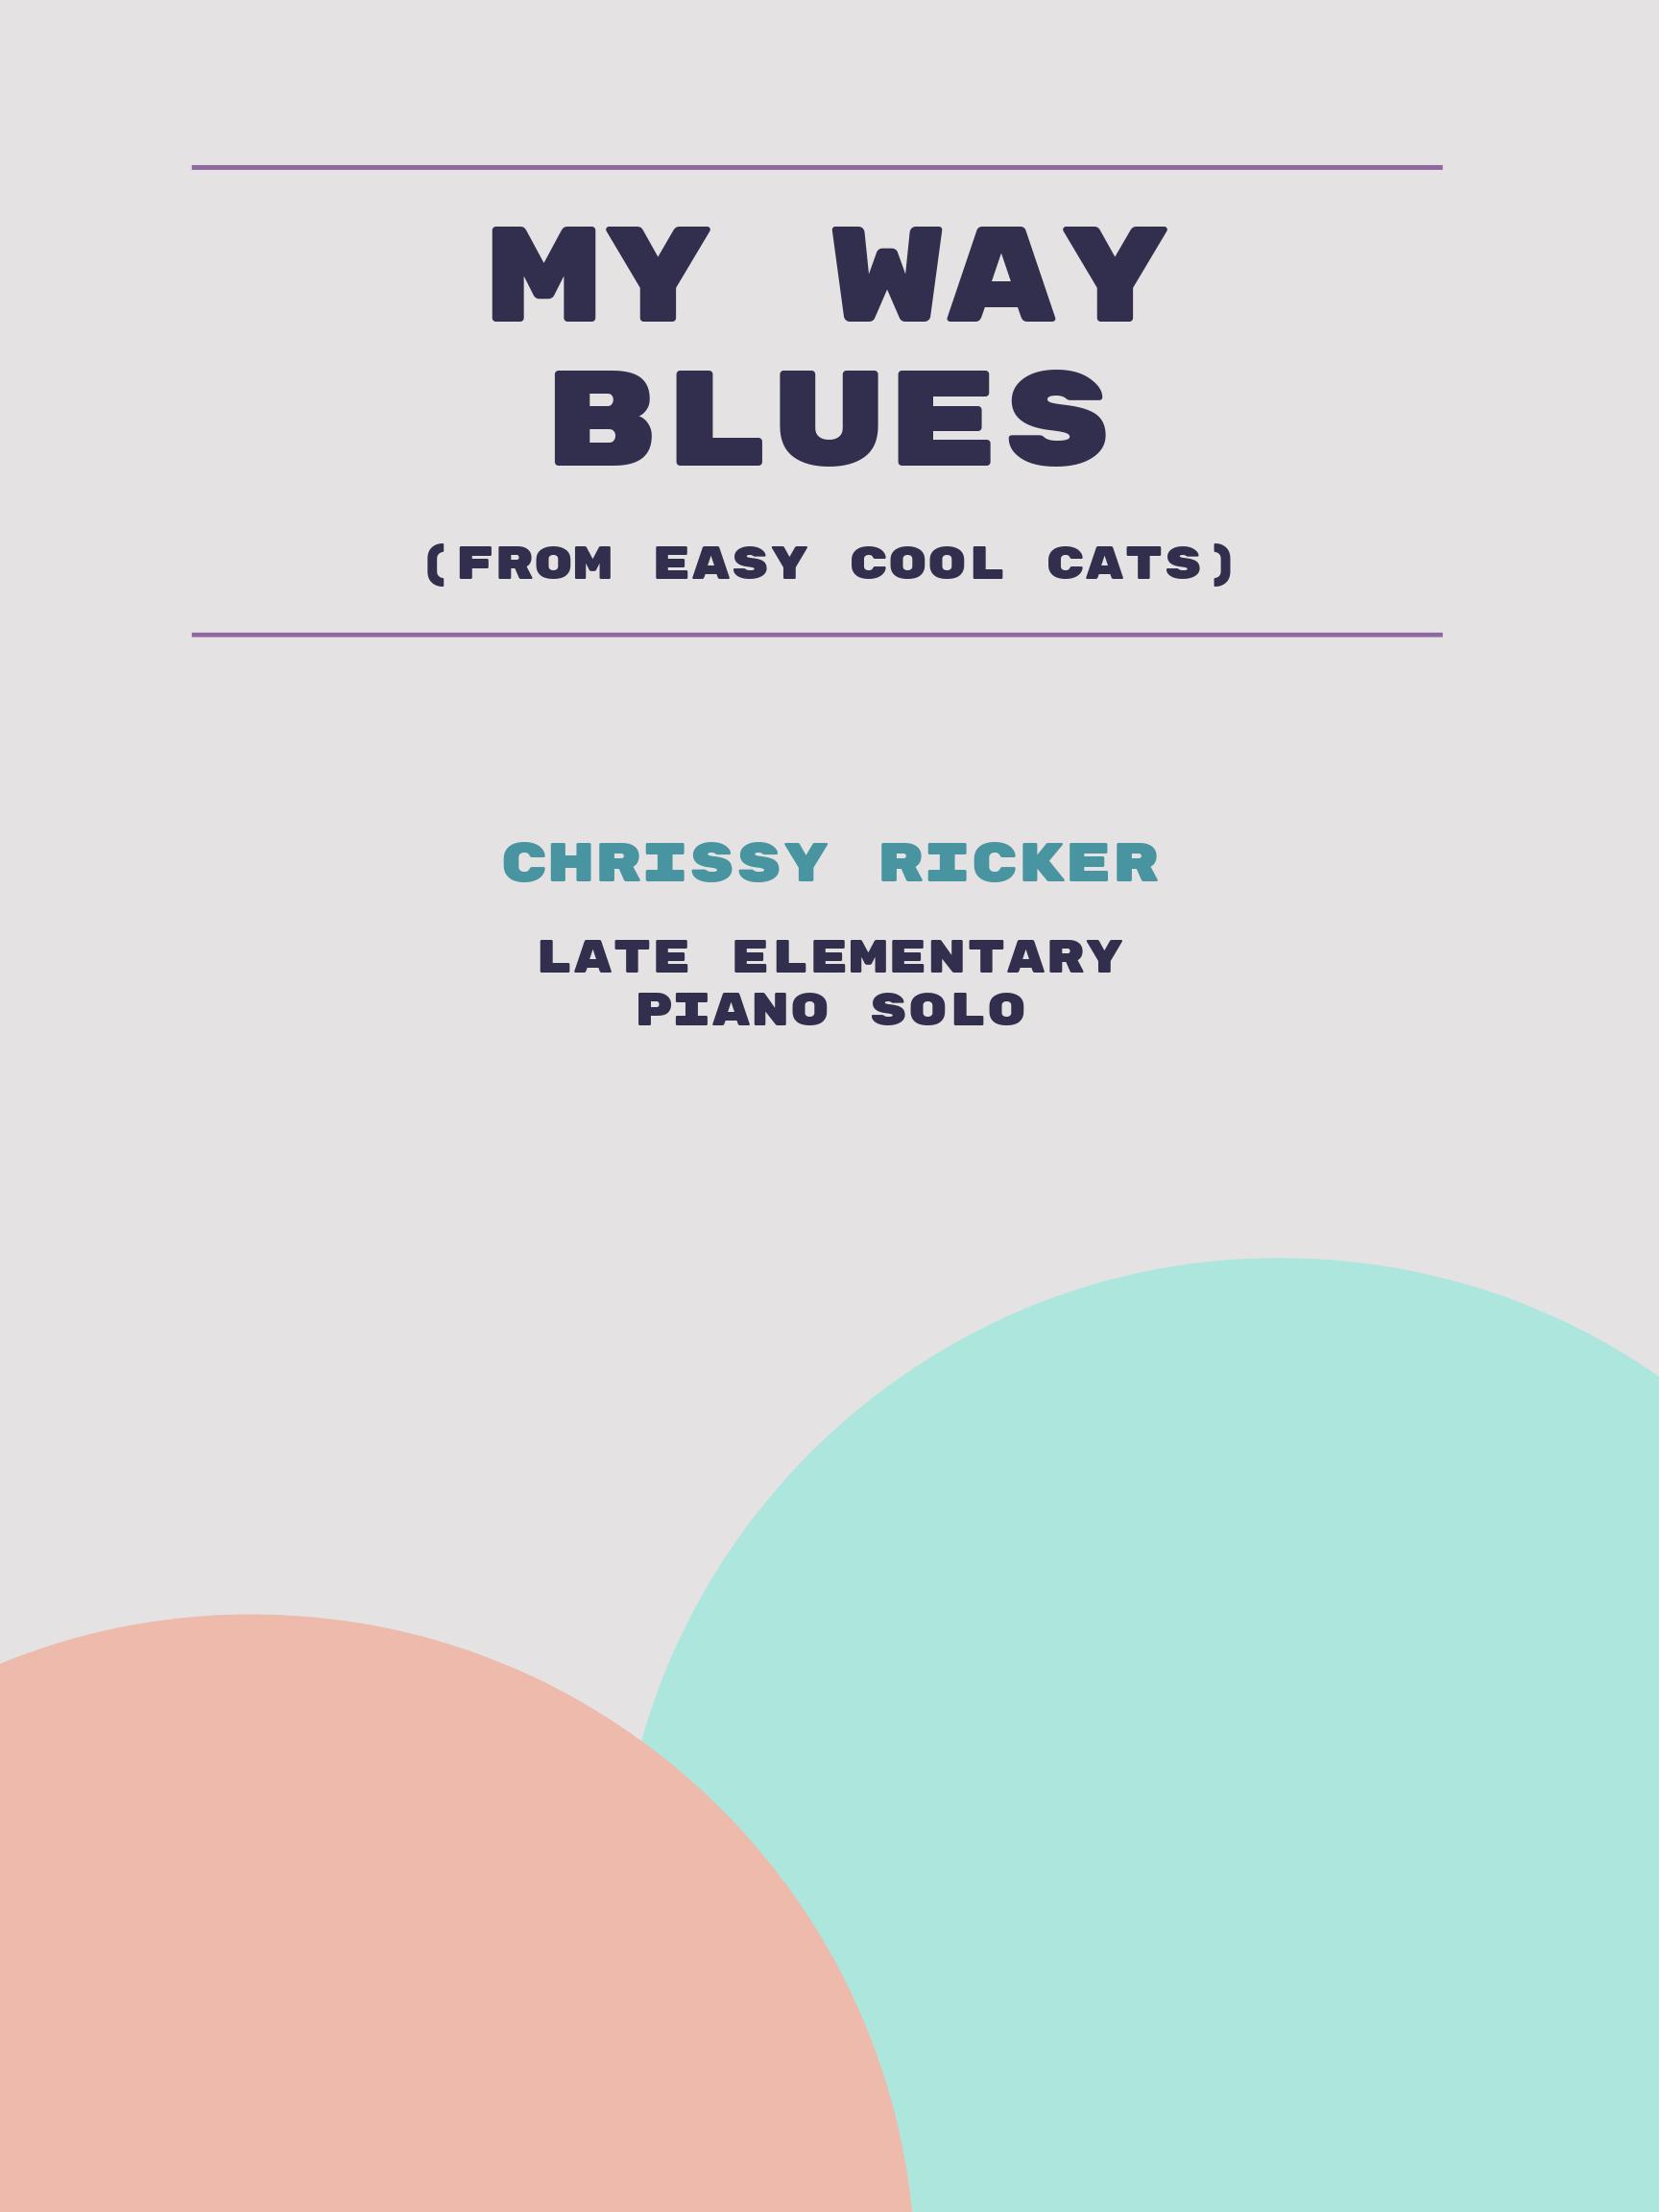 My Way Blues by Chrissy Ricker